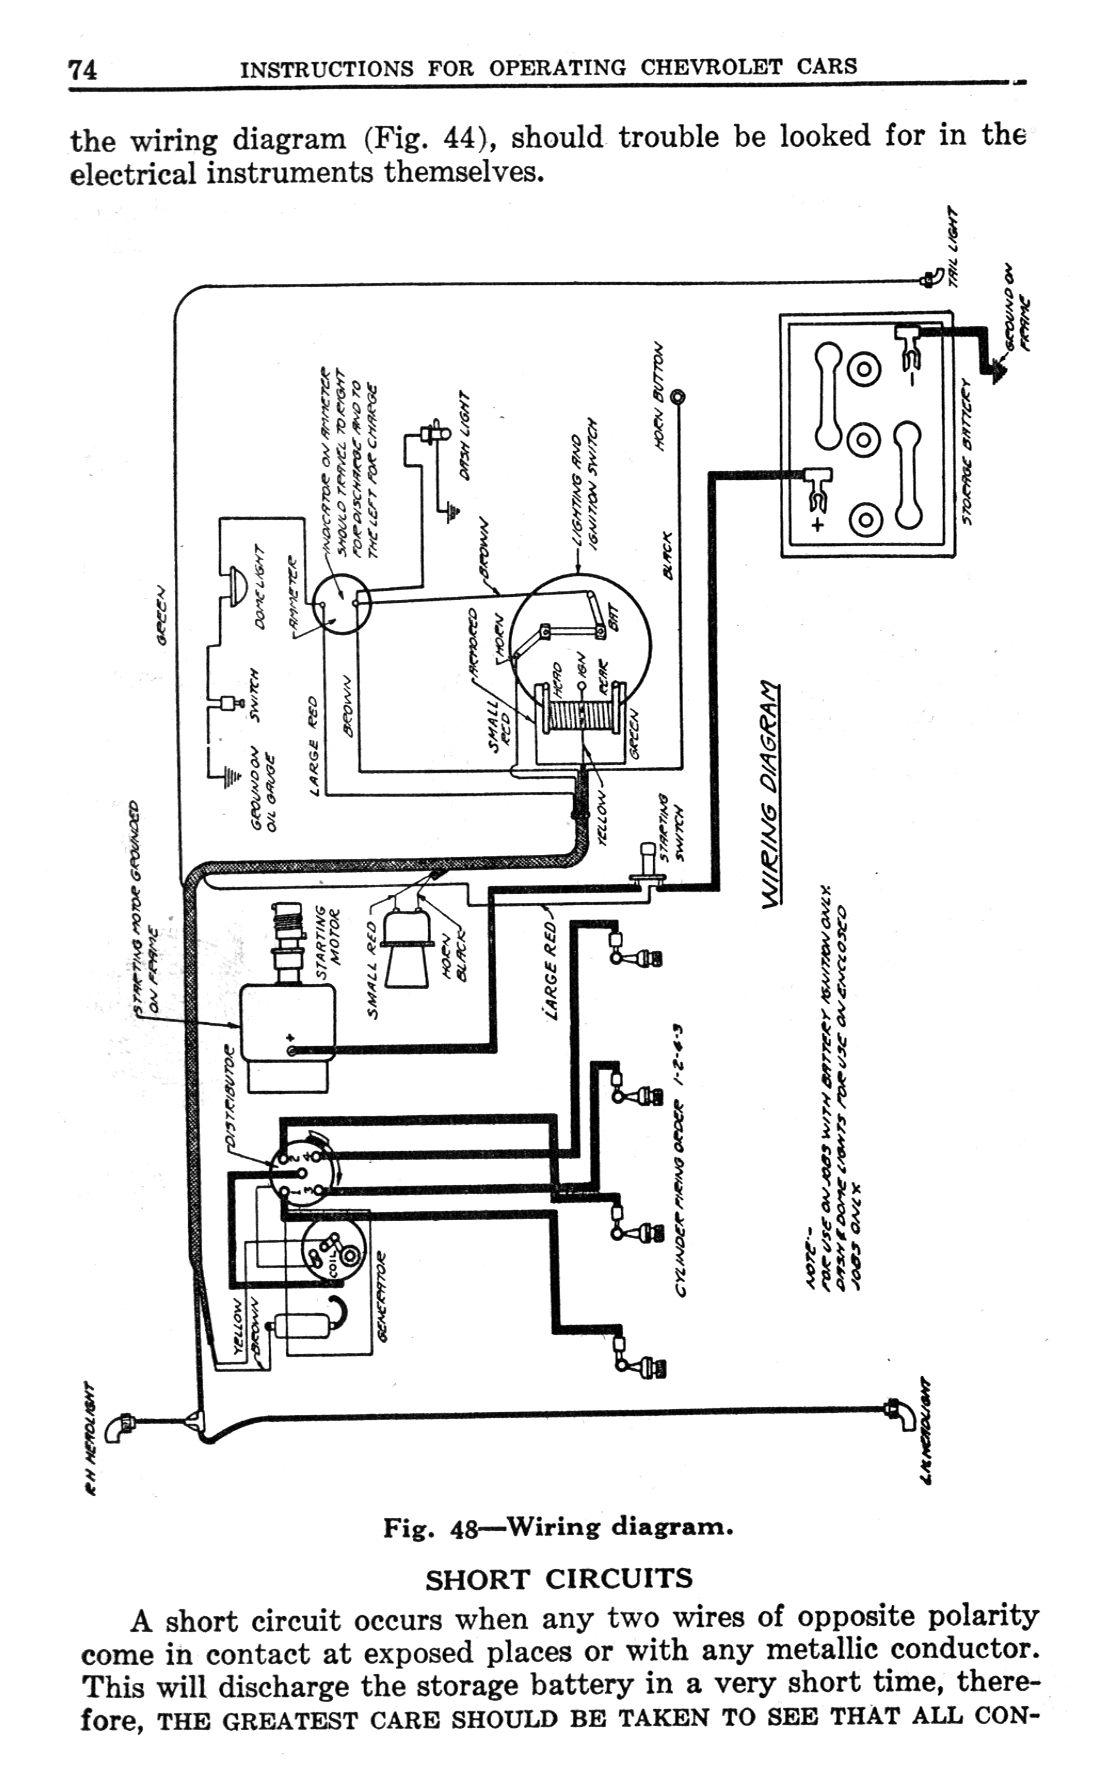 hight resolution of 1948 crosley car wiring diagram simple wiring schema sears wiring diagram crosley wiring diagram wiring diagram